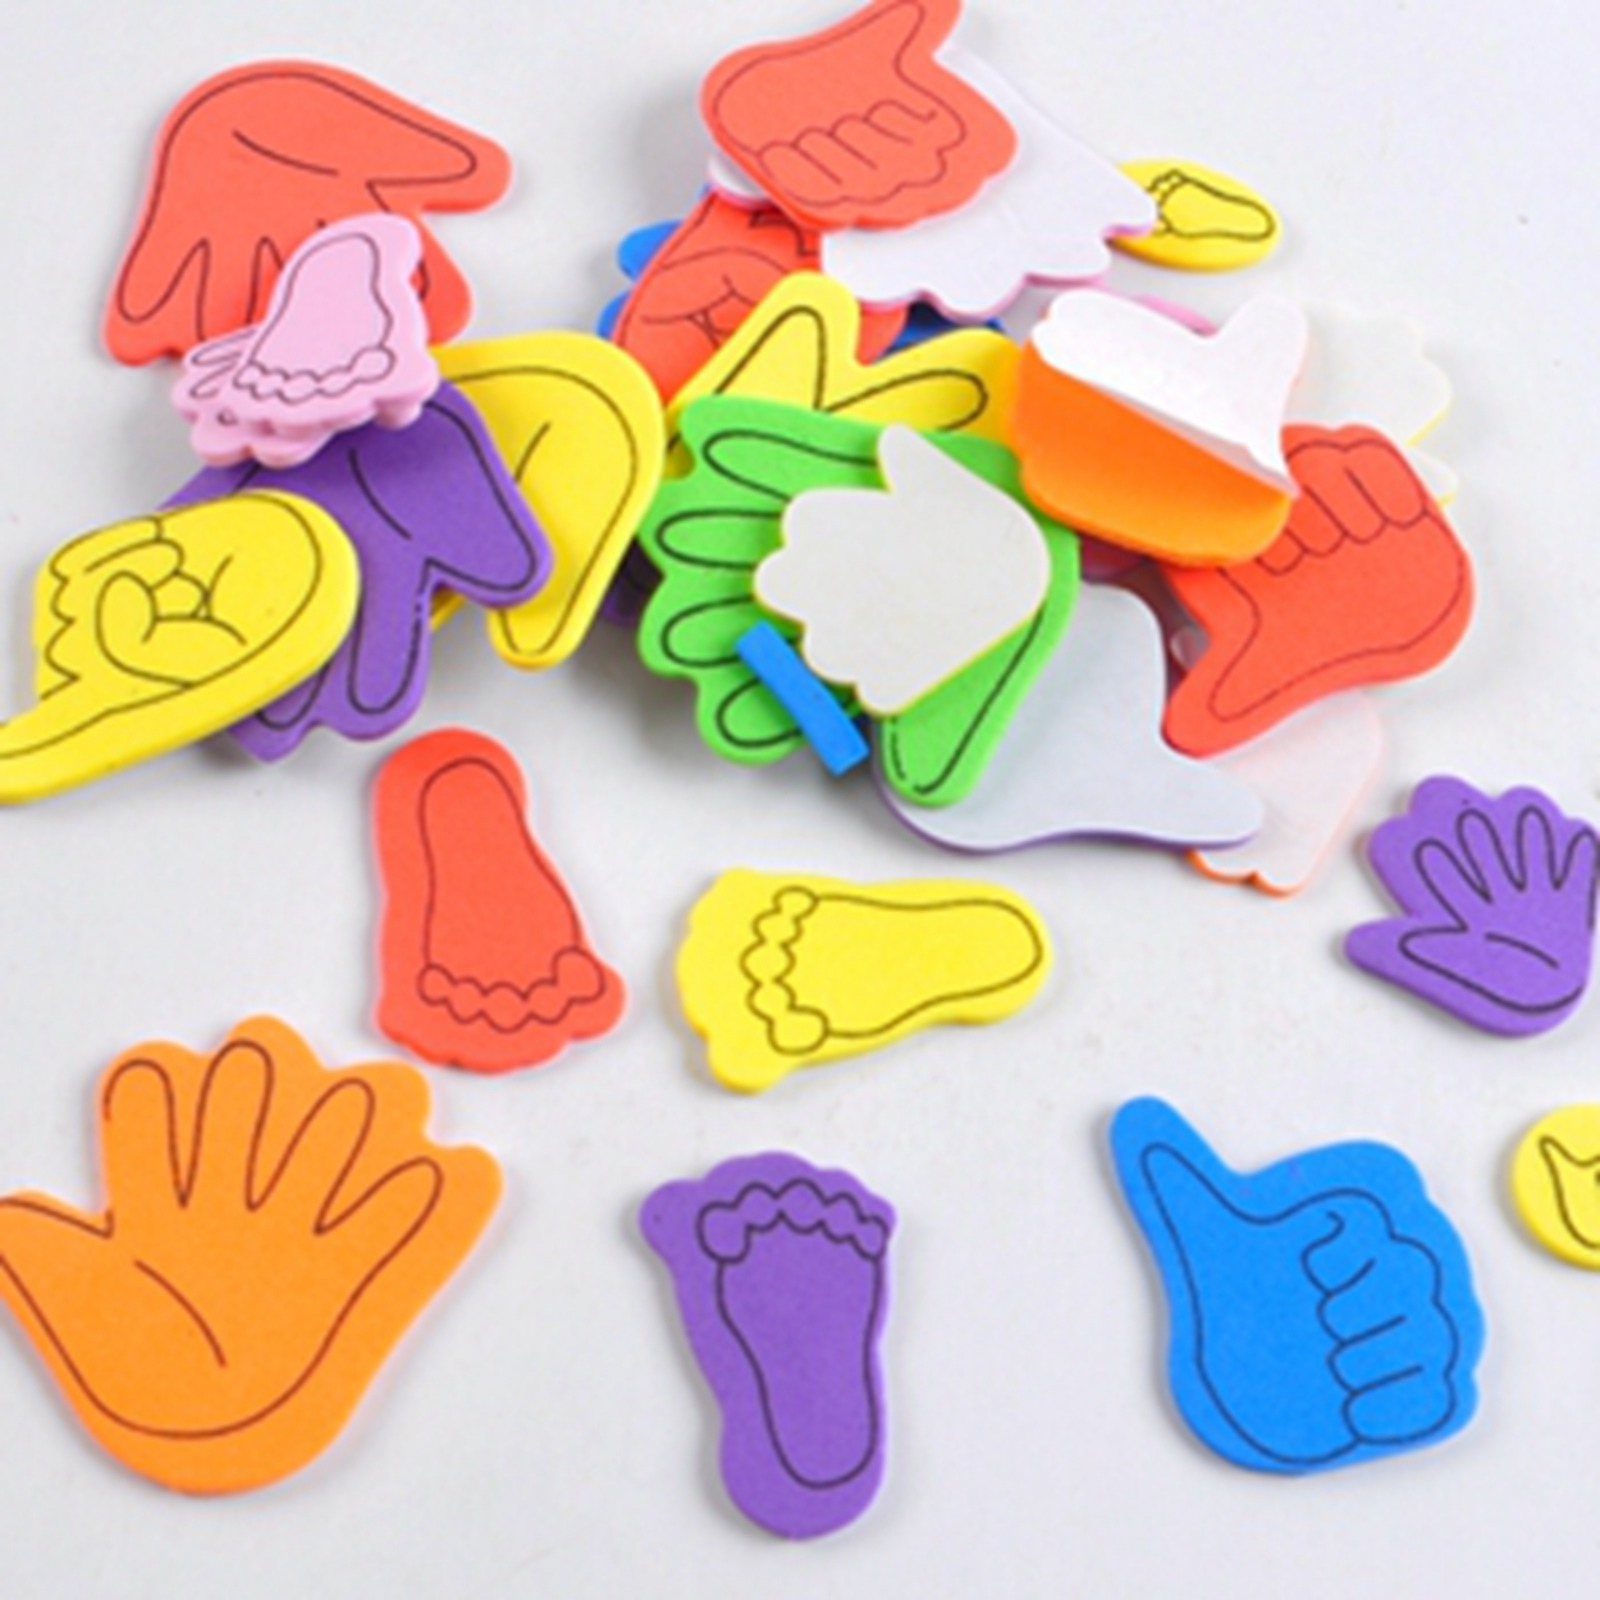 EVA Self-Stick Hands and Foots